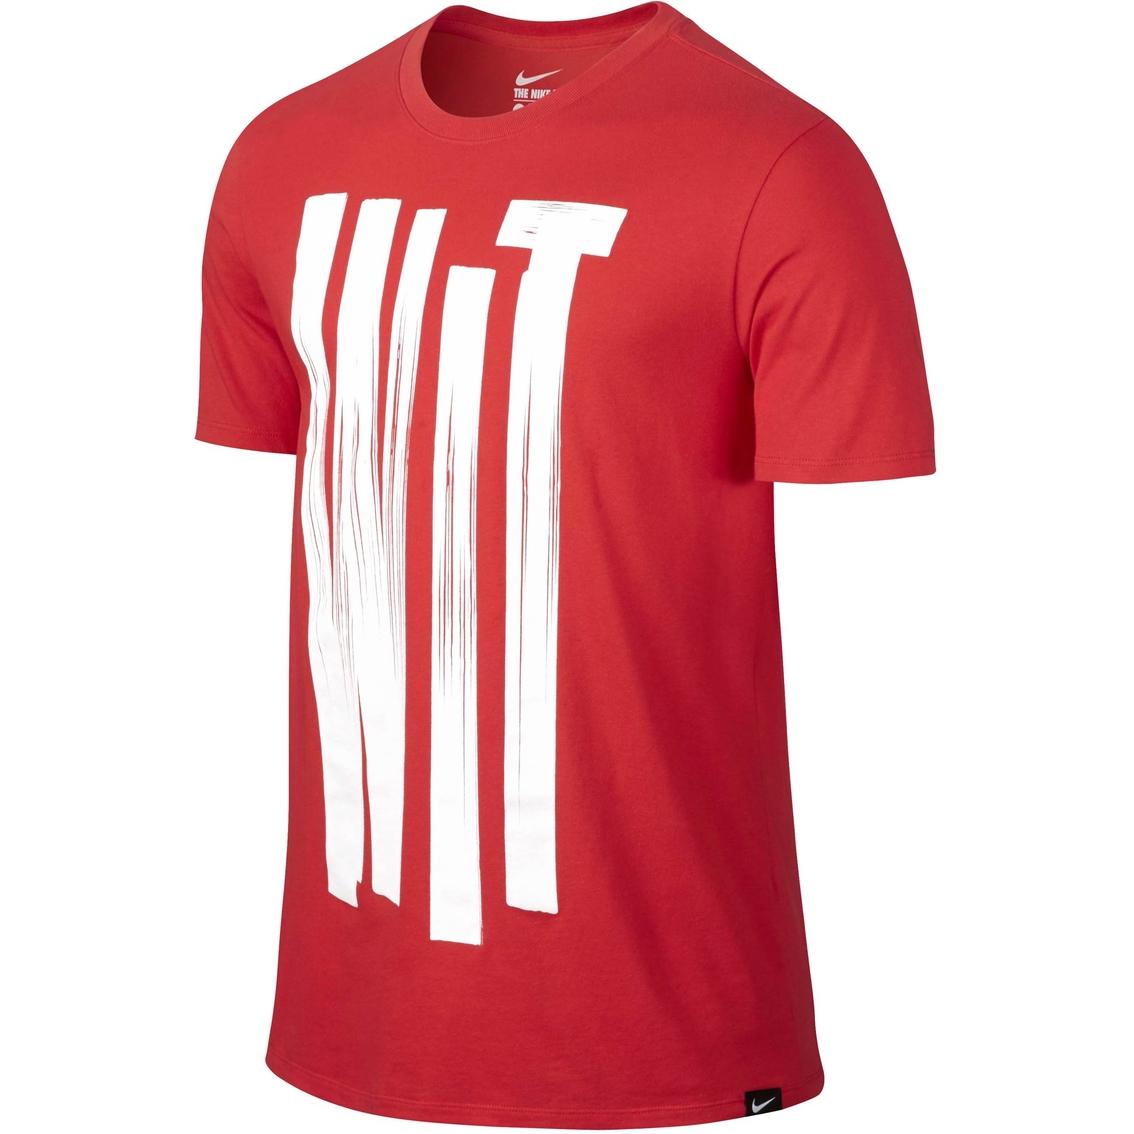 6aebecdc M 5b57371a8869f74414003917 Source · Nike Lebron Witness Tee Shirts Apparel  Shop The Exchange